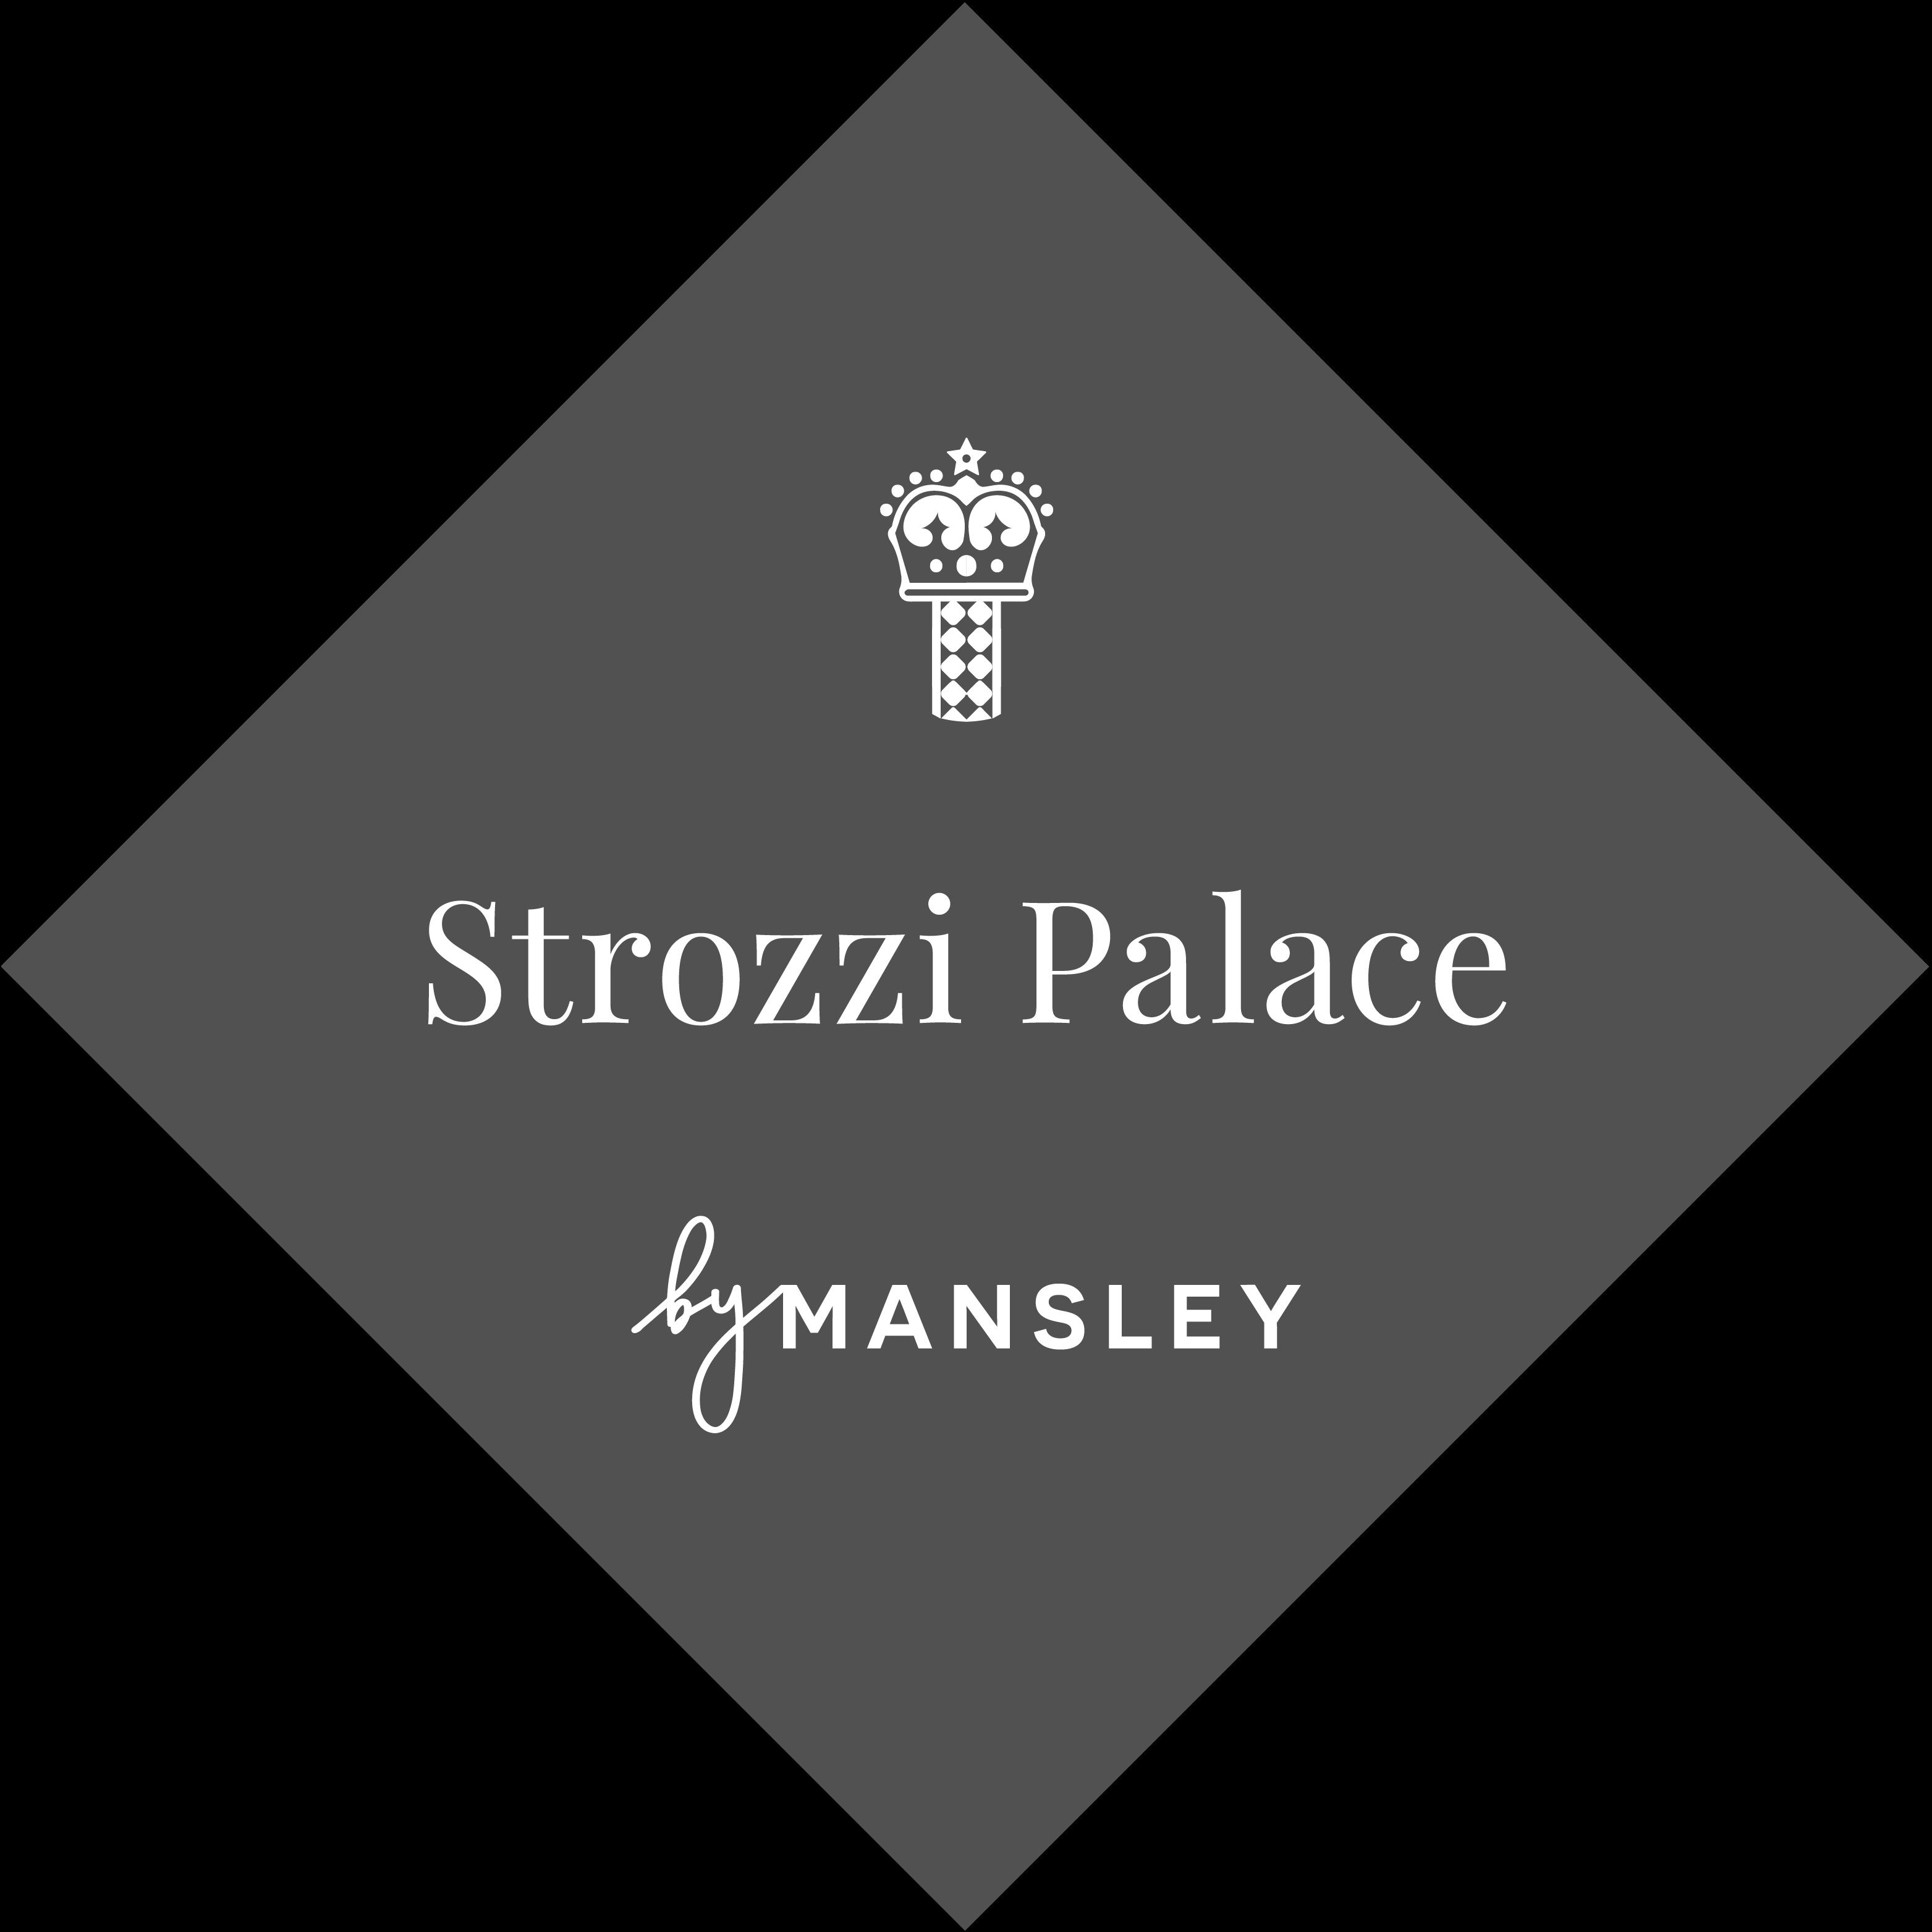 strozzi palace suites diamond icon